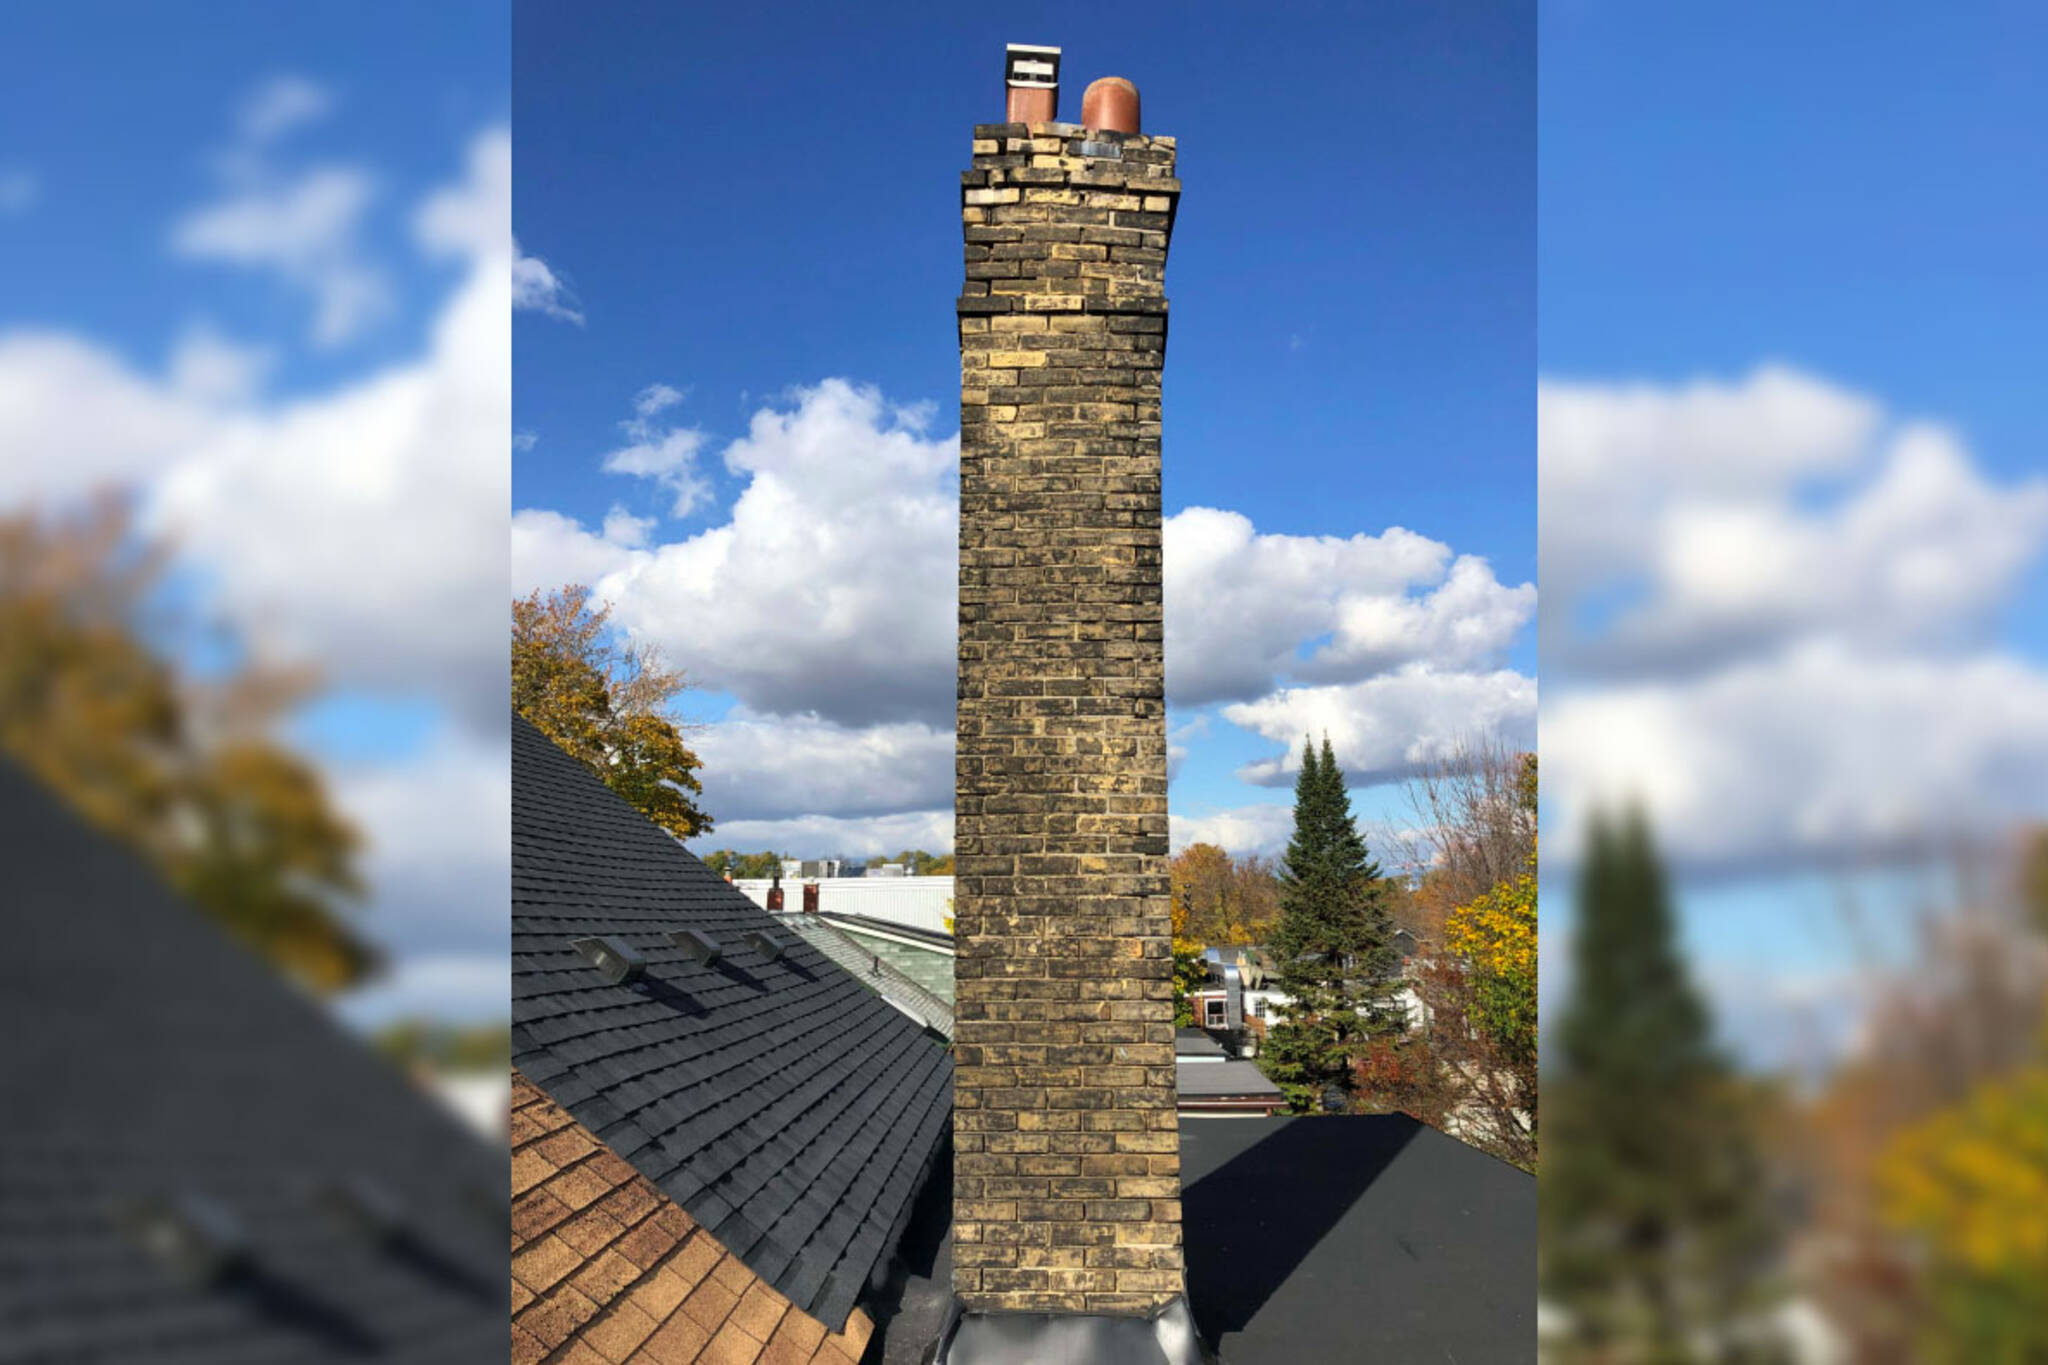 Tall chimney toronto